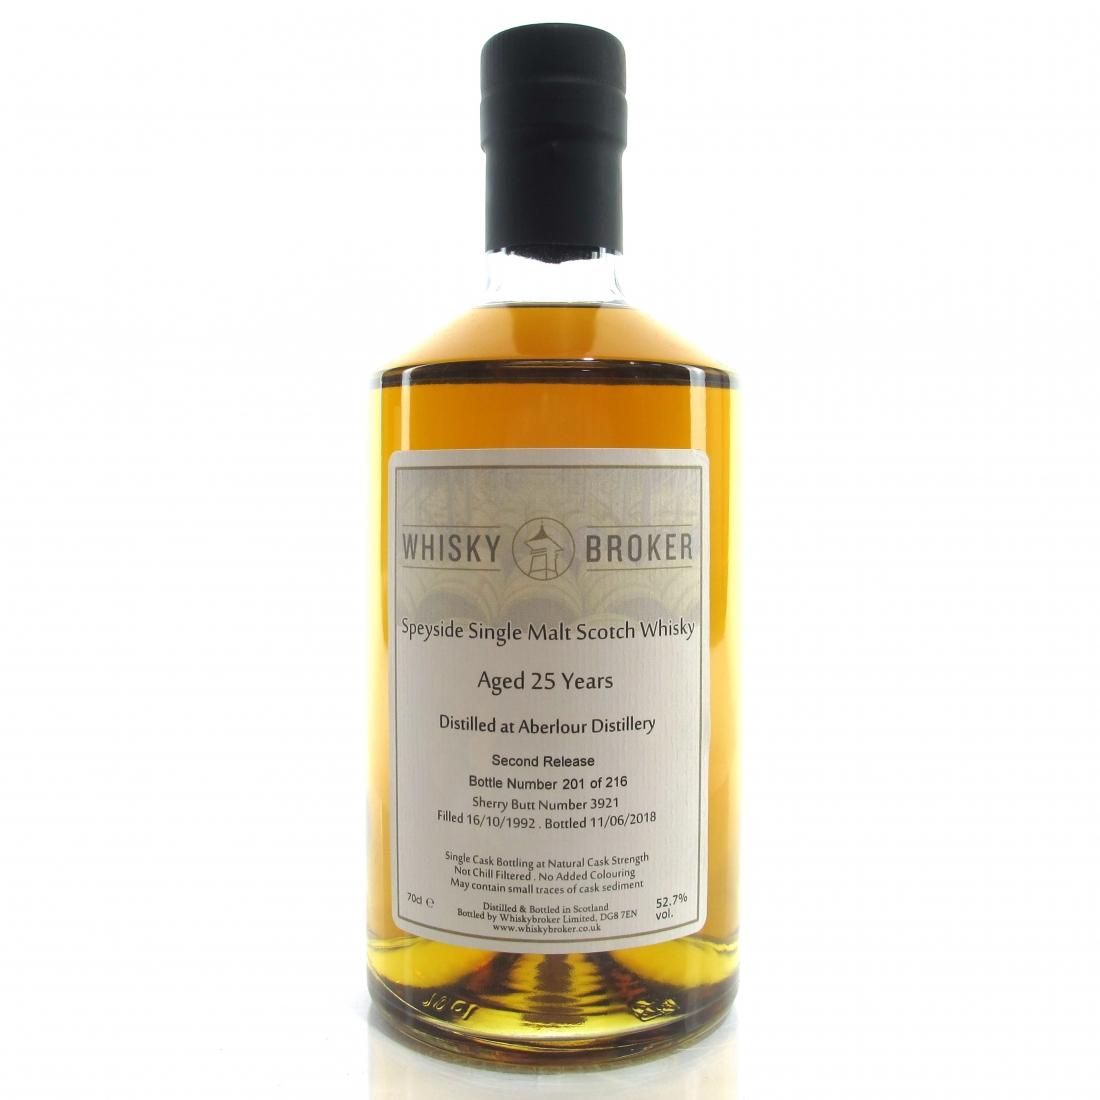 Aberlour 1992 Whisky Broker 25 Year Old